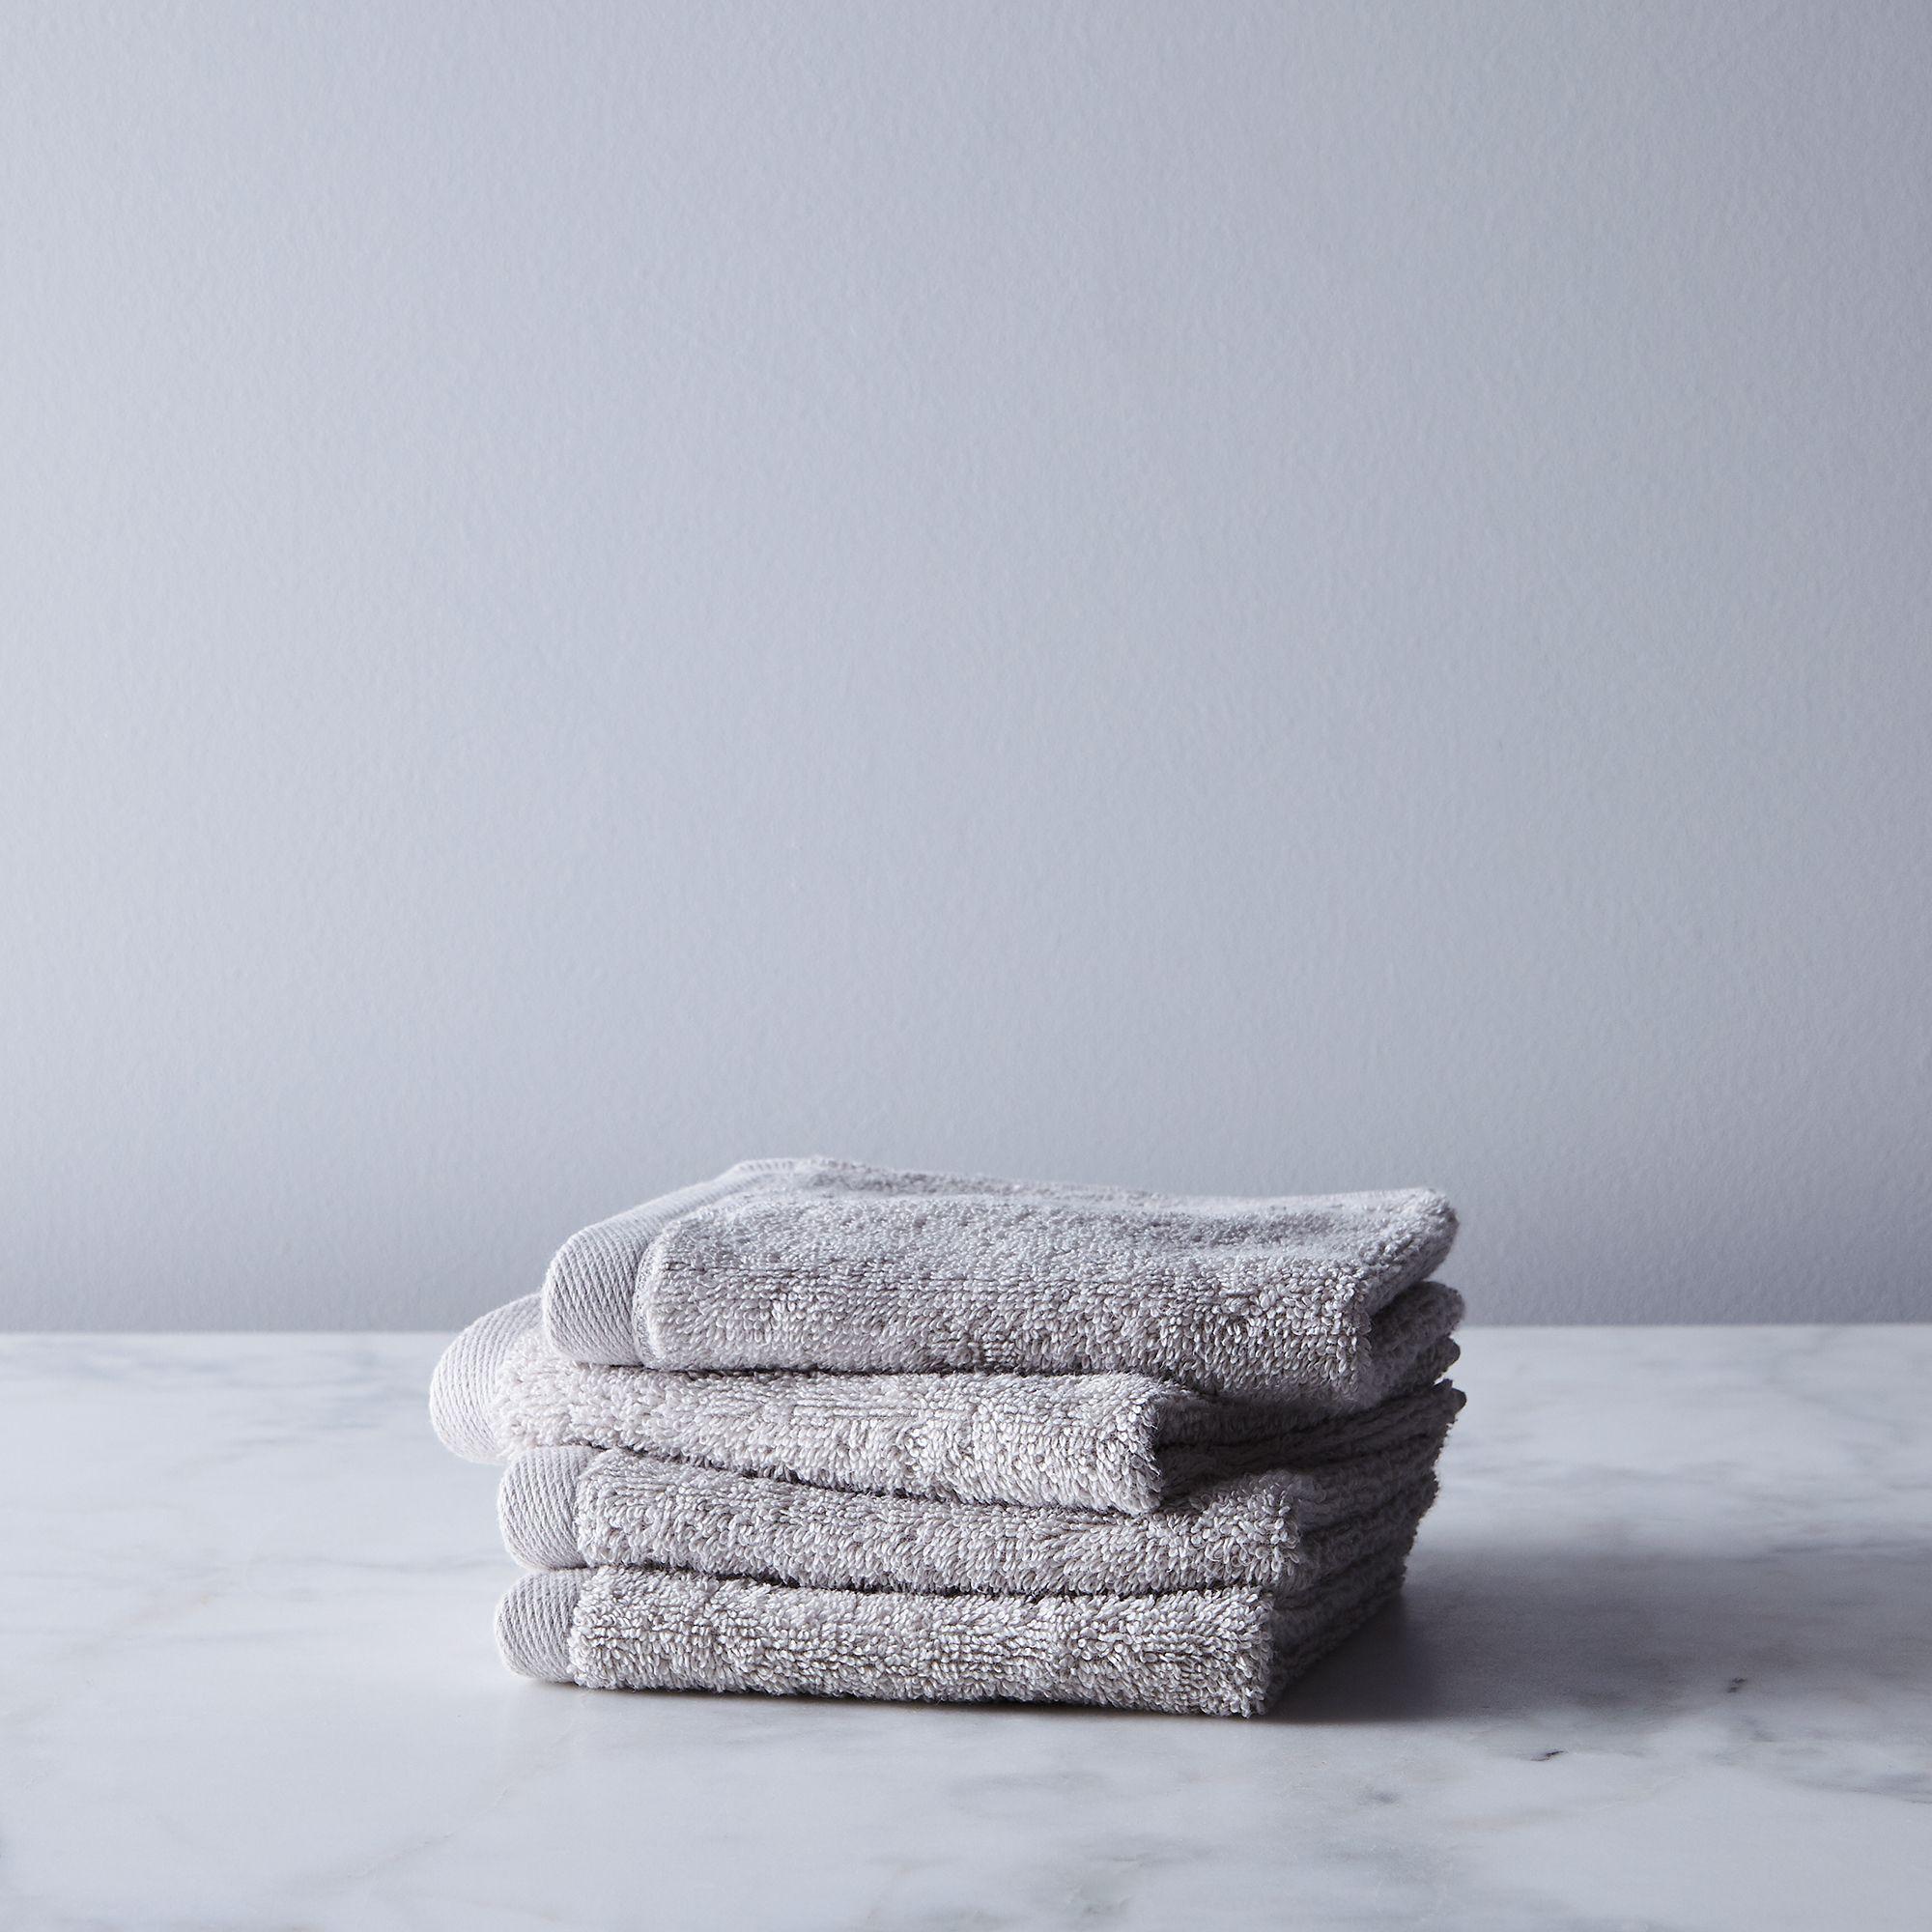 D51f0784 a9d8 4100 9349 c1c76b2a1109  2017 0926 snowe home soft cotton towels washcloth set of 4 ash grey silo rocky luten 014